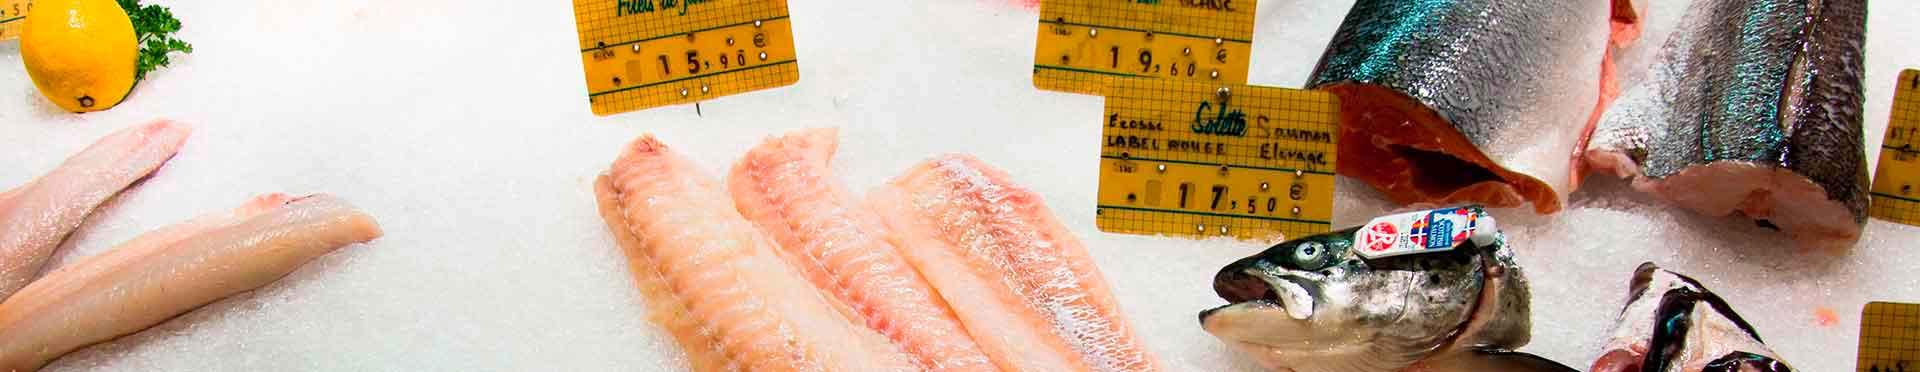 Implantación de IFS Markets en pescaderías